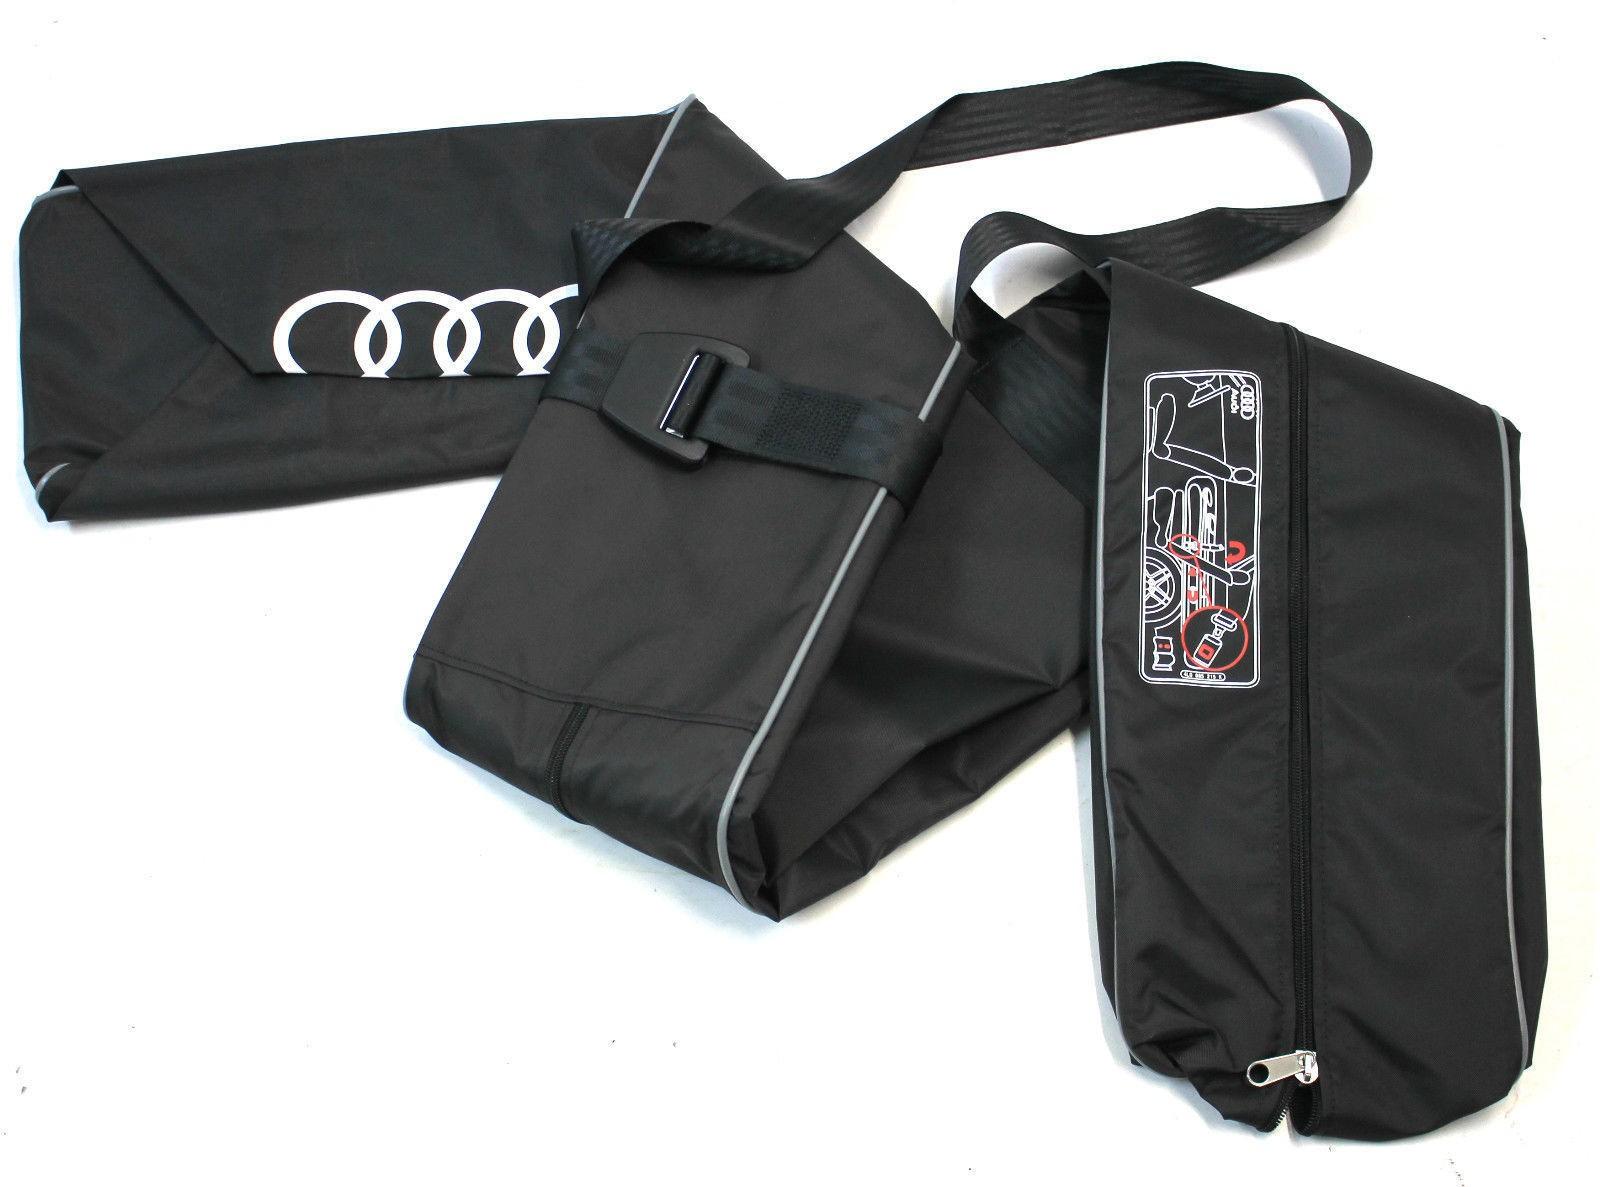 Audi a4 8k a6 4f q7 sacca borsa porta sci originale nuova - Sacca porta sci ...